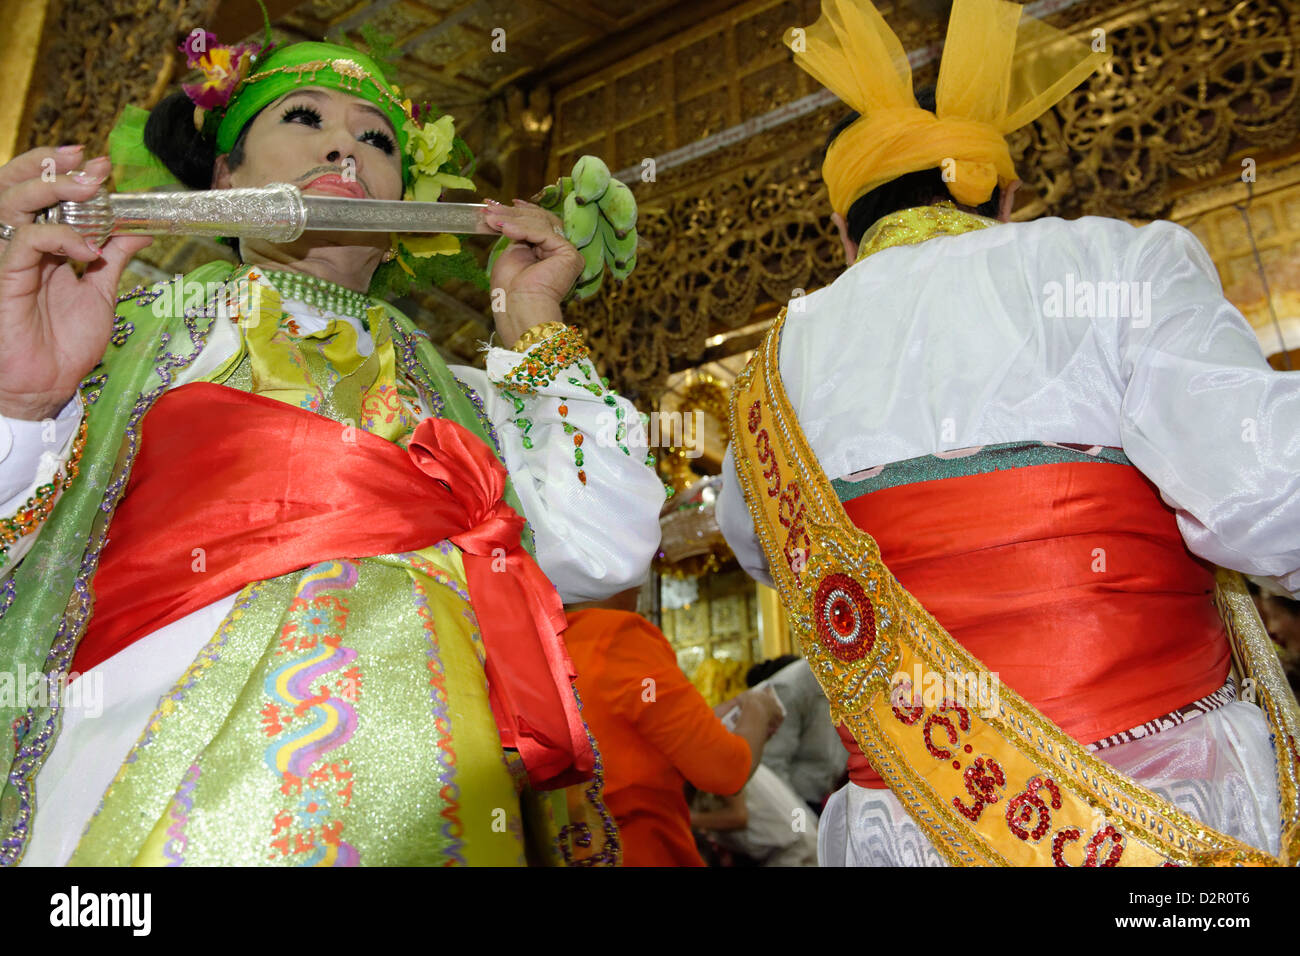 Das größte Nat-Ritual (Festival der Geister) statt in Taungbyon, Mandalay-Division, Myanmar Stockbild